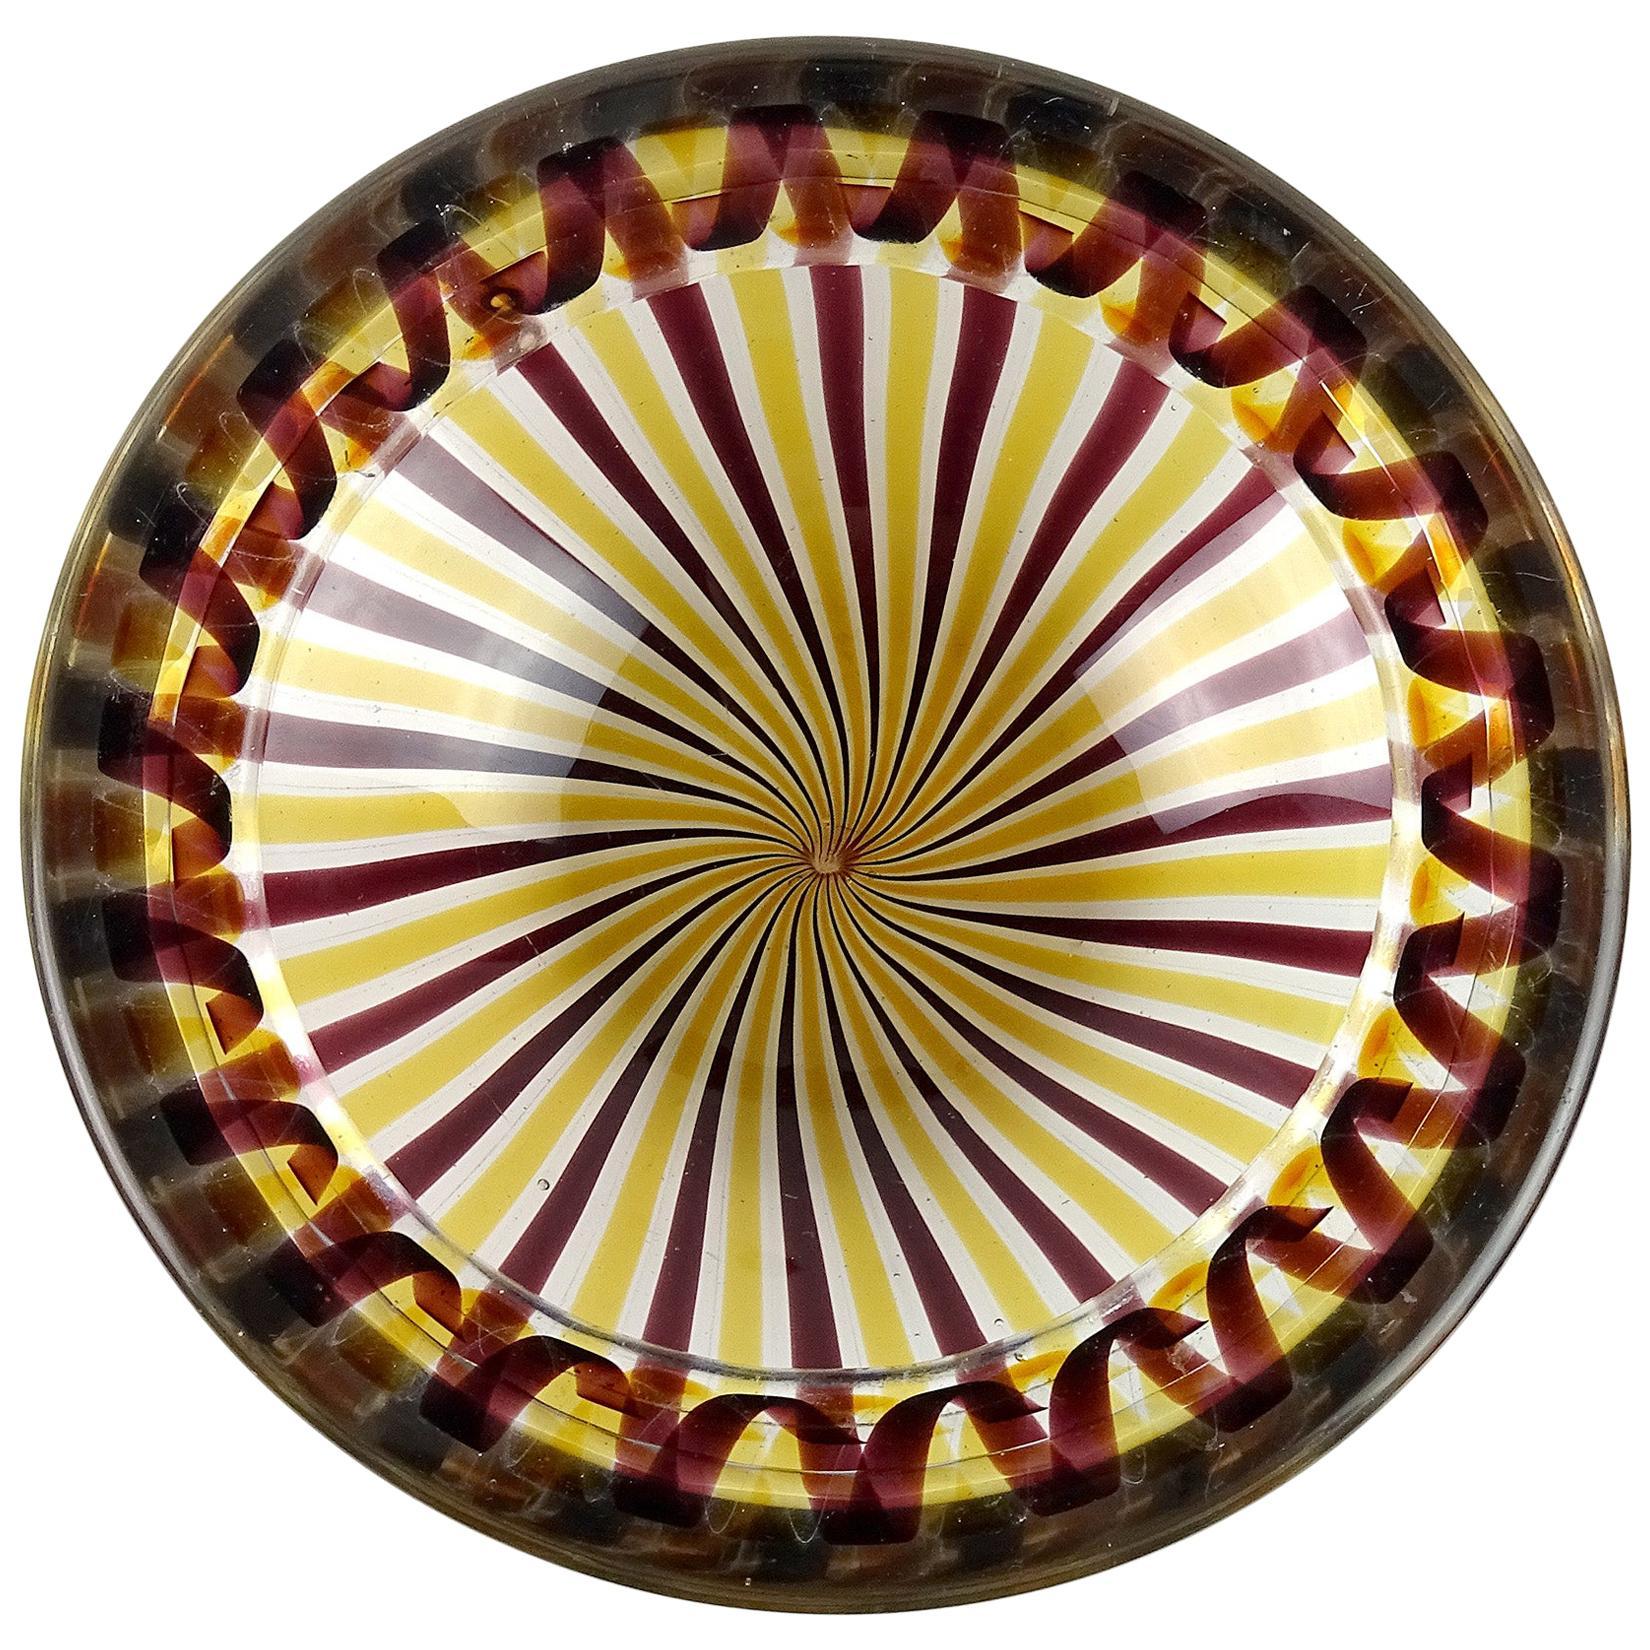 Fratelli Toso Murano Yellow Wine Purple Ribbons Italian Art Glass Bowl